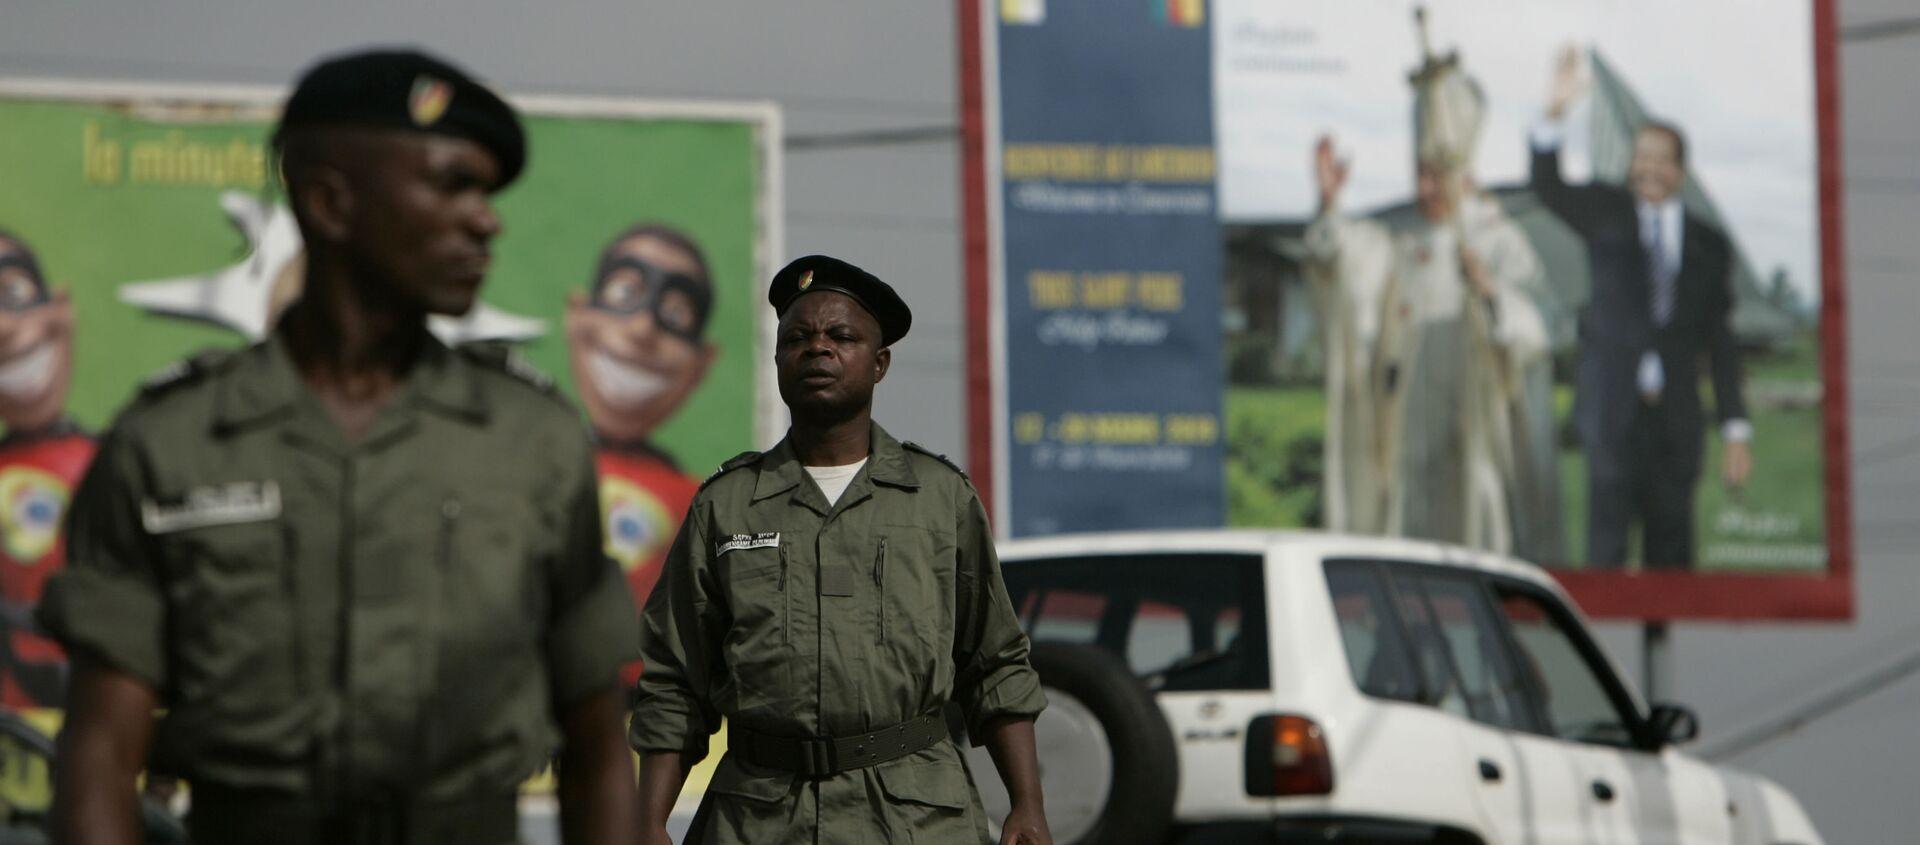 Des policiers au Cameroun - Sputnik France, 1920, 27.10.2020